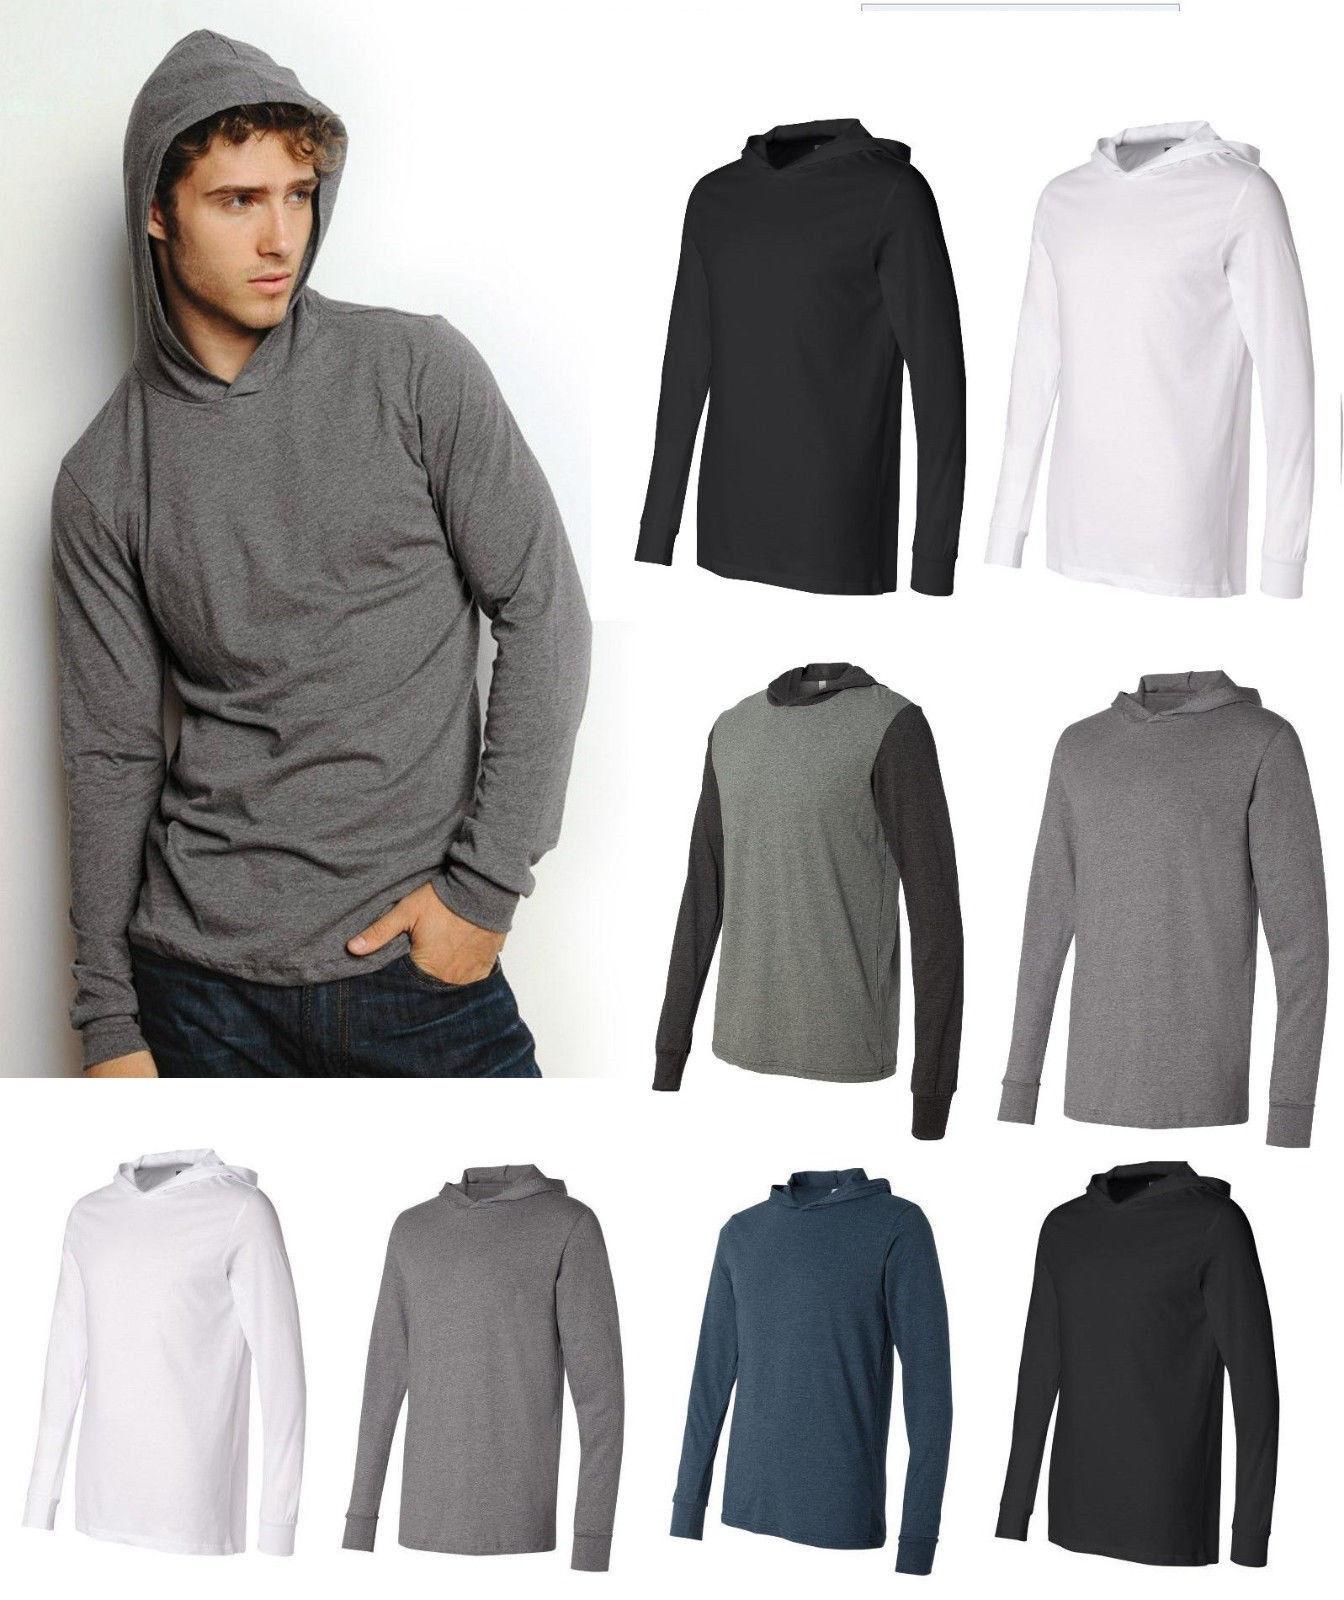 Long Sleeve T Shirt Hoodie | eBay